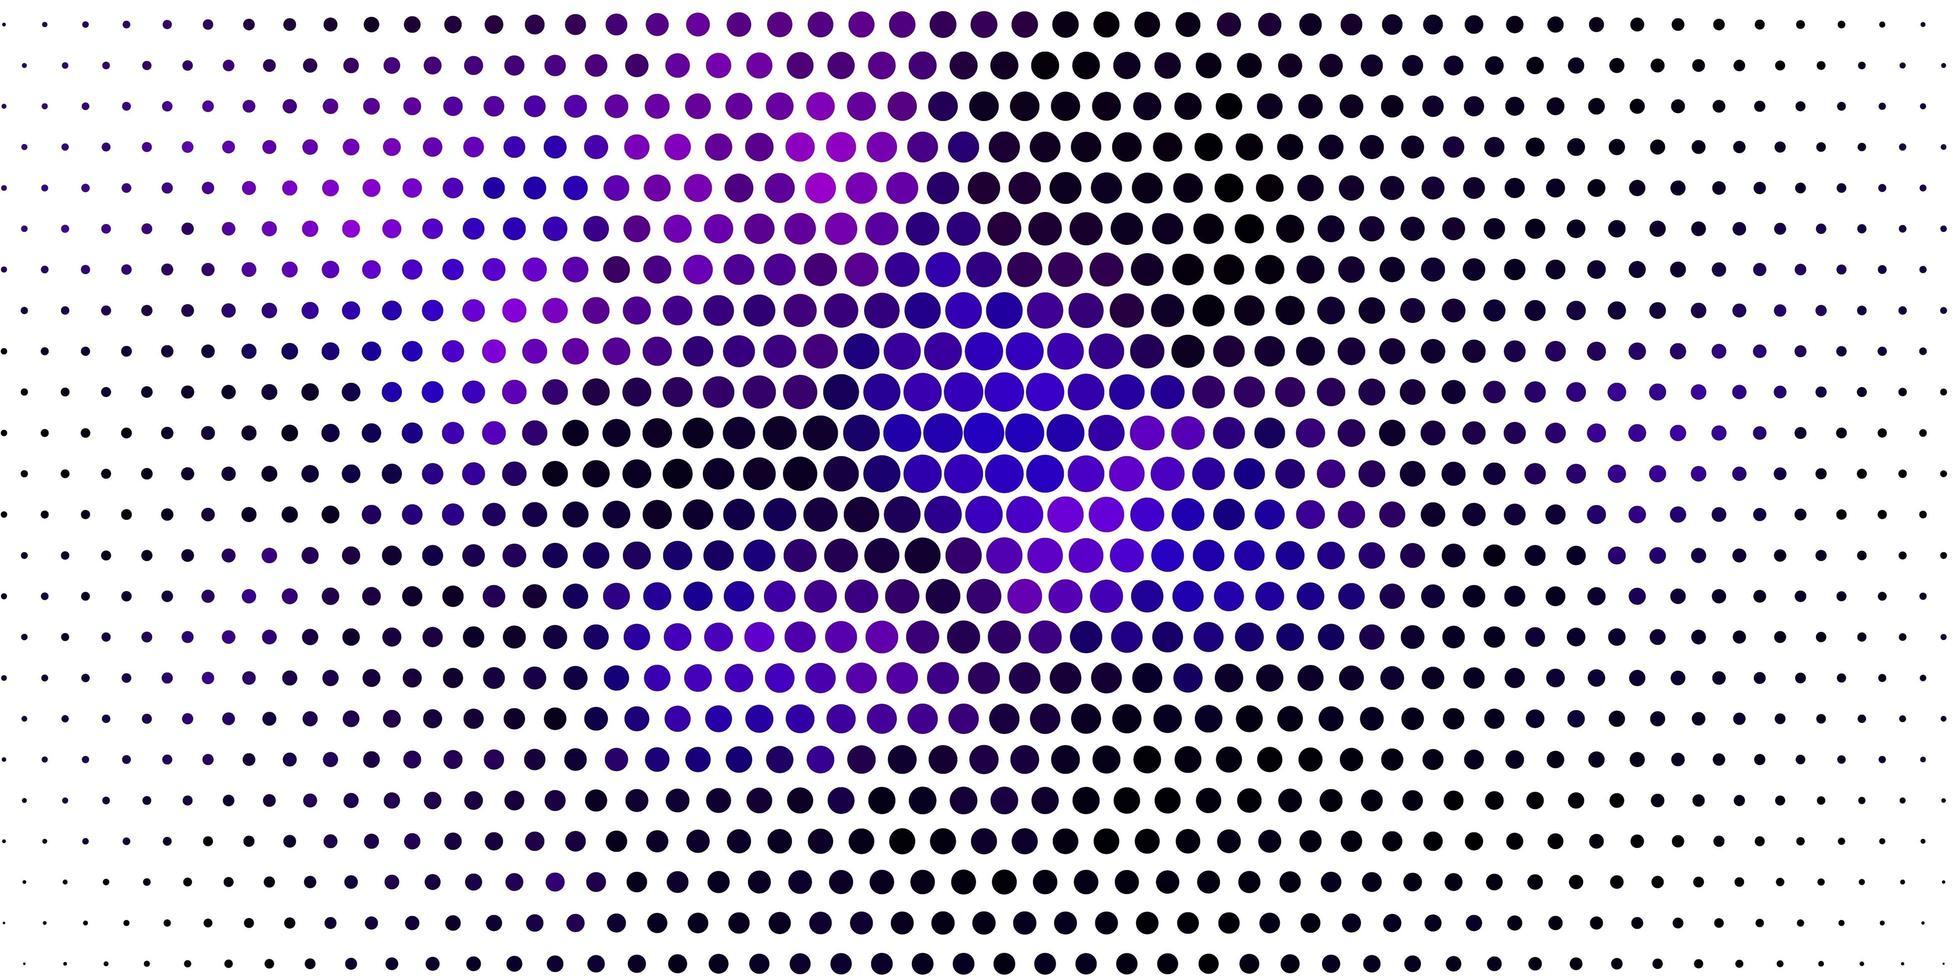 layout roxo com formas de círculo. vetor